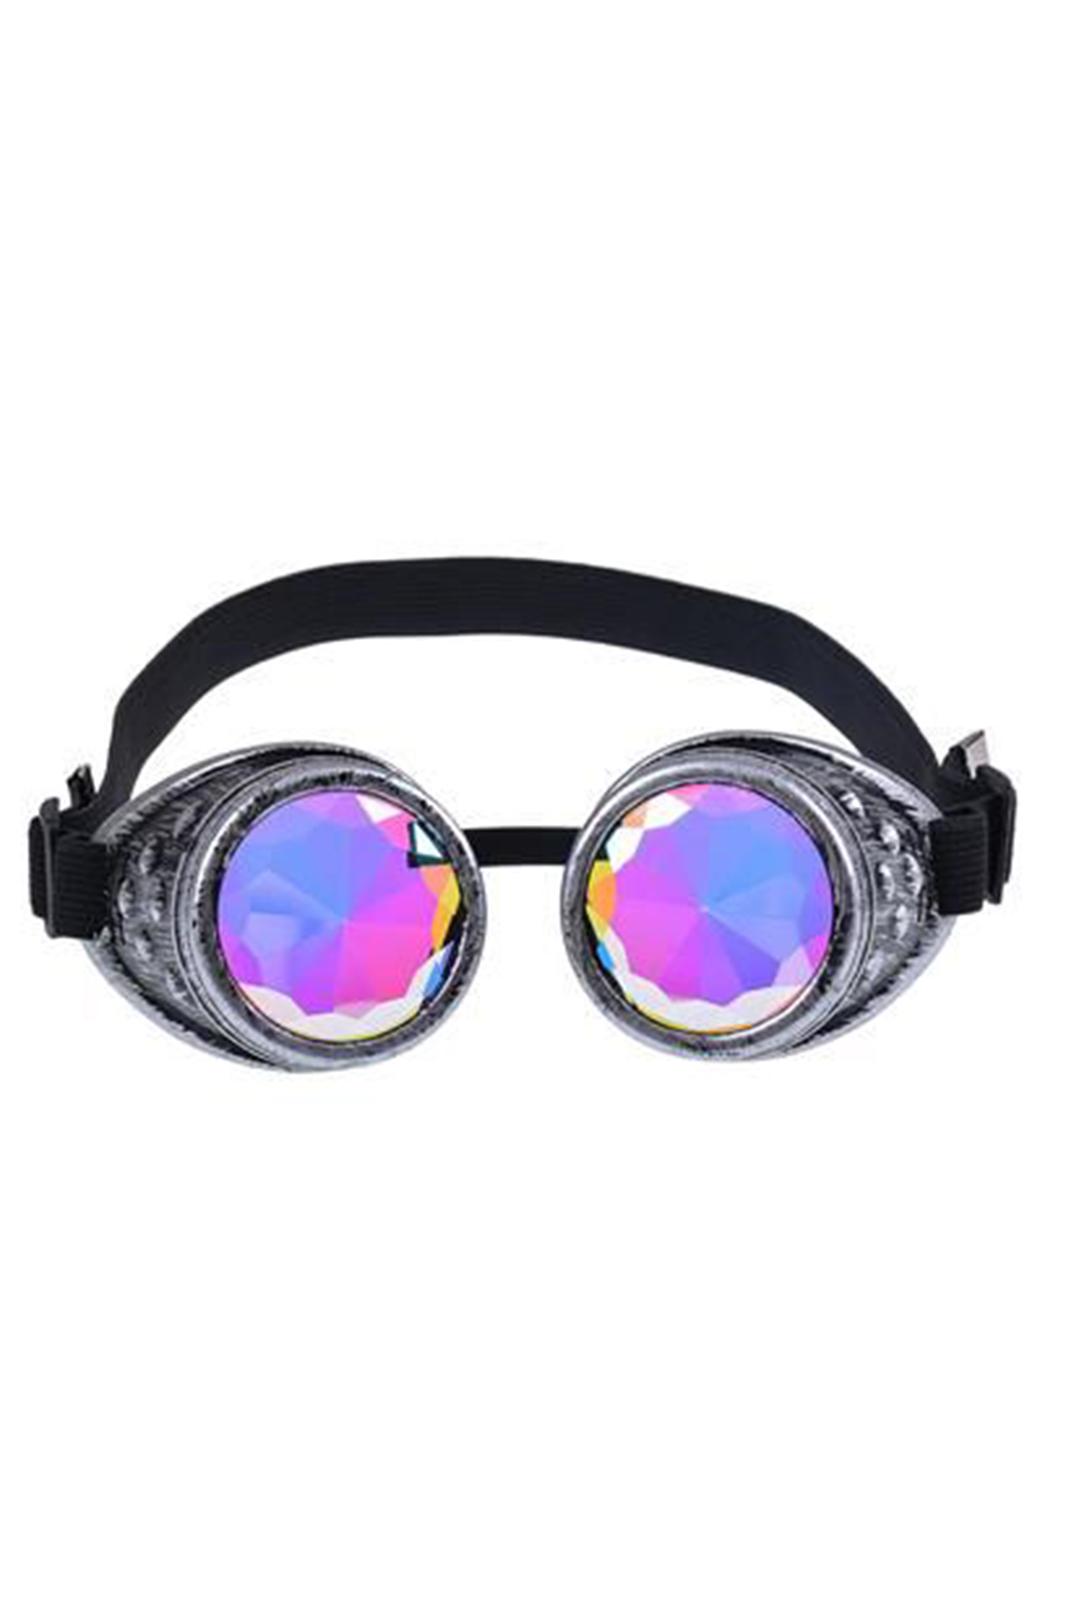 Antique Silver Kaleidoscope Goggles